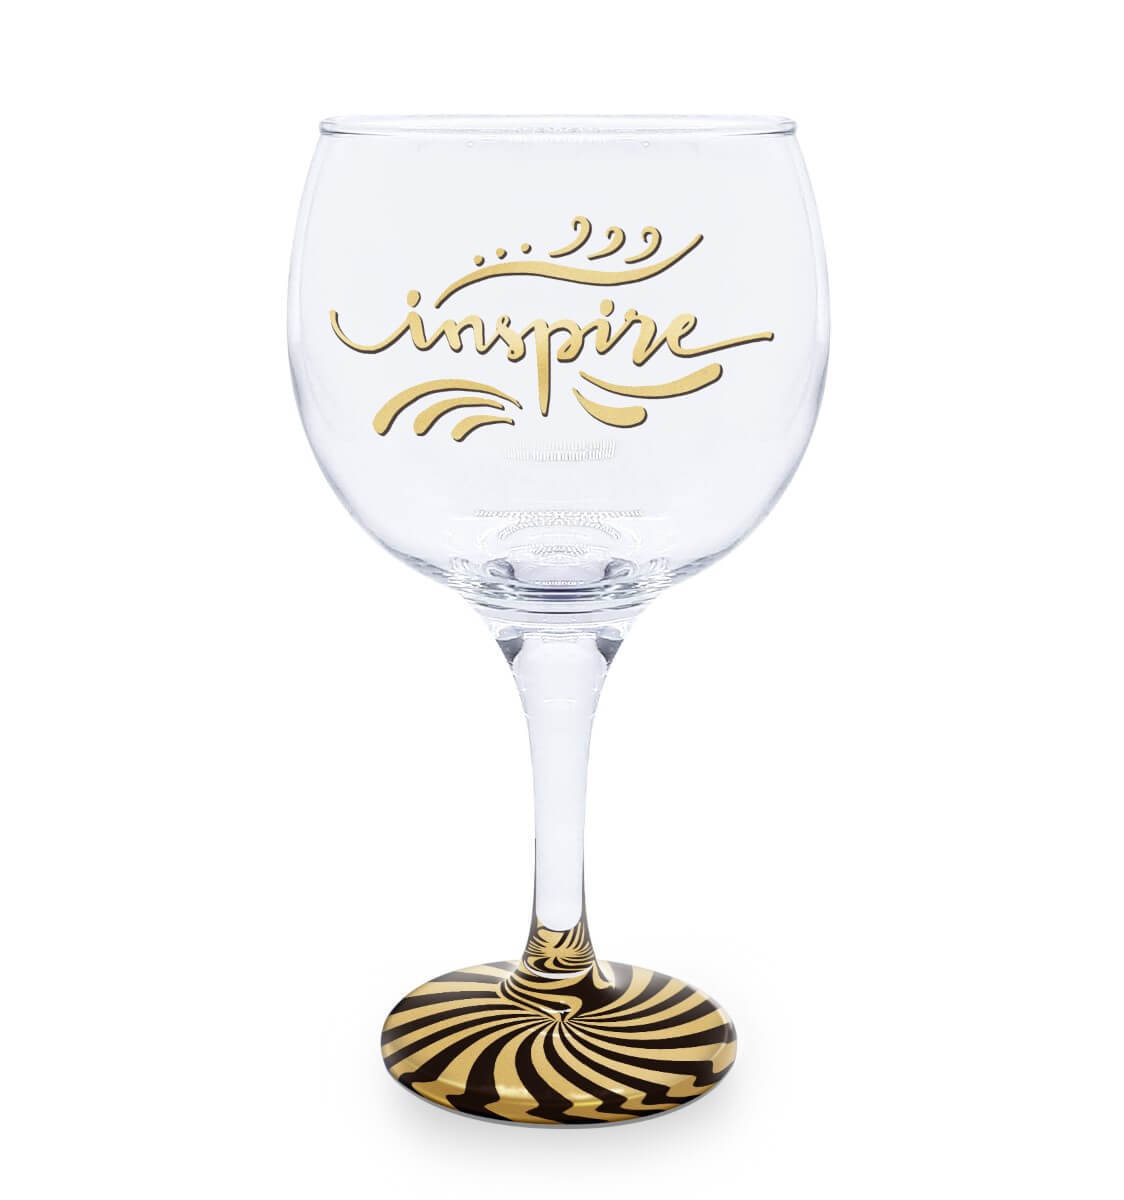 Taça Gin Vidro Inspire Base Preta e Dourada 600ml